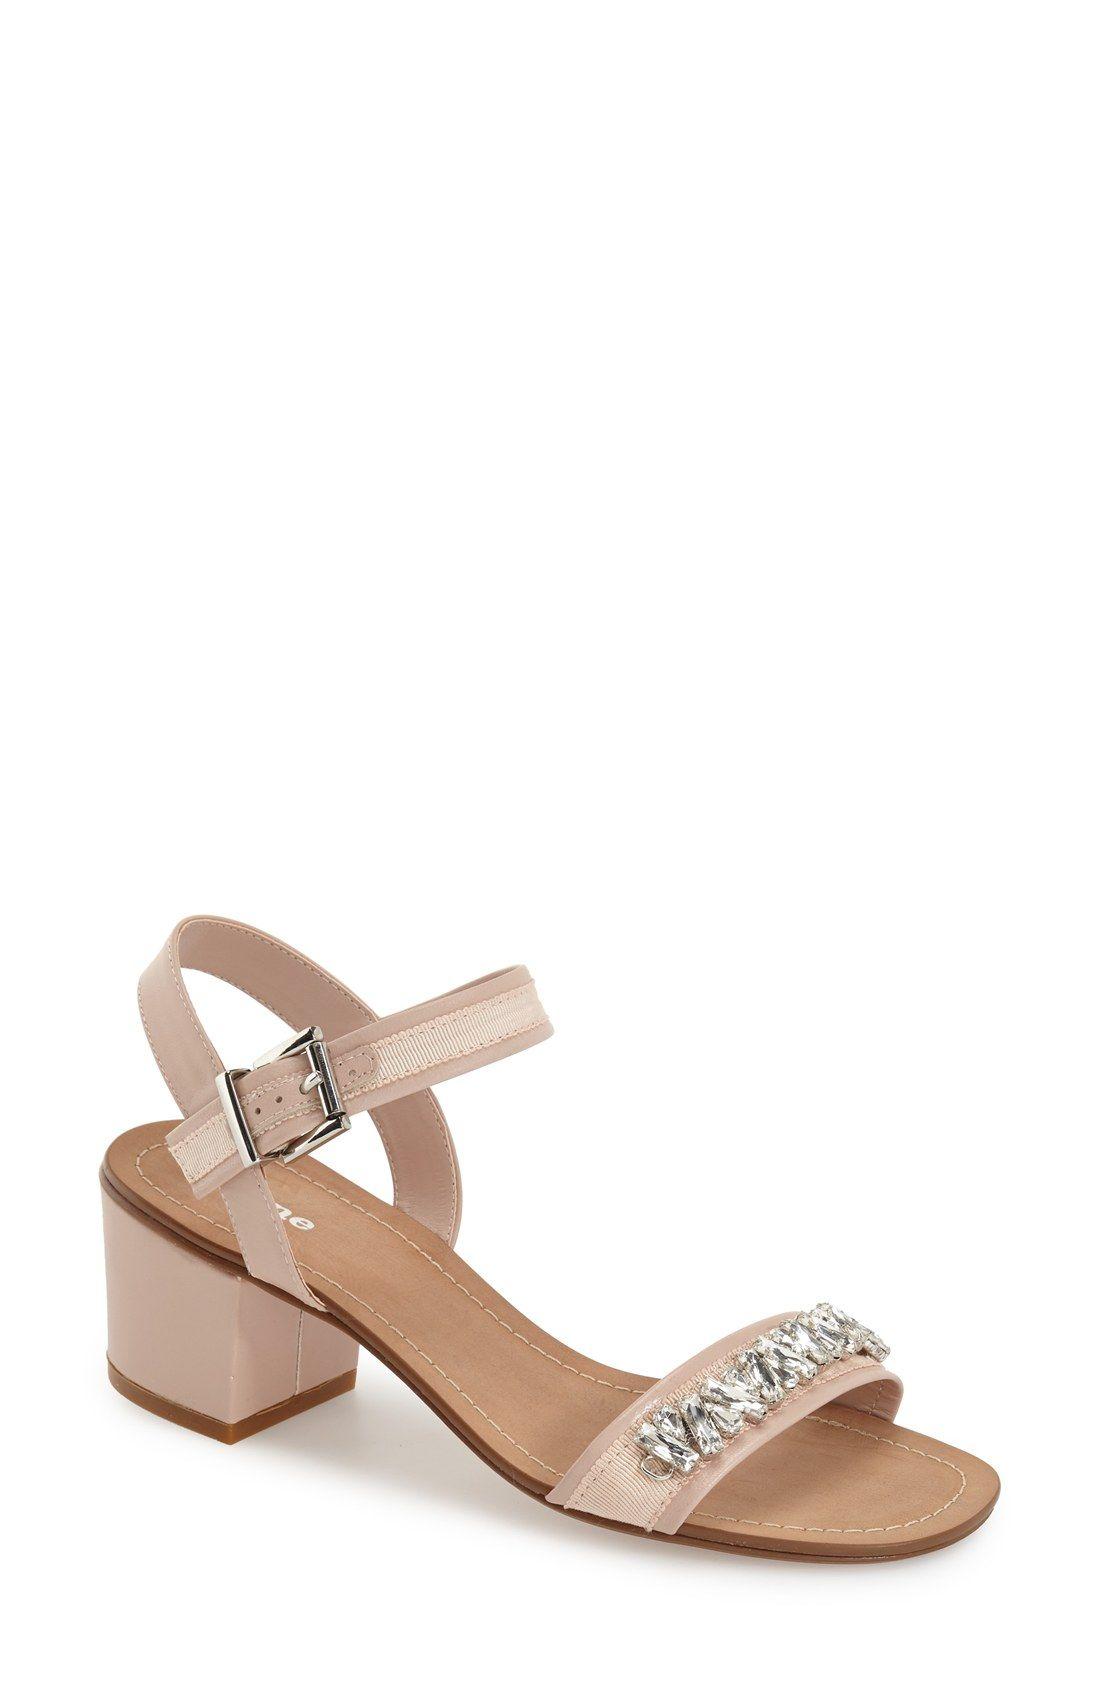 54e00256c5c Dune London 'Maisie' Embellished Block Heel Sandal (Women)   My ...